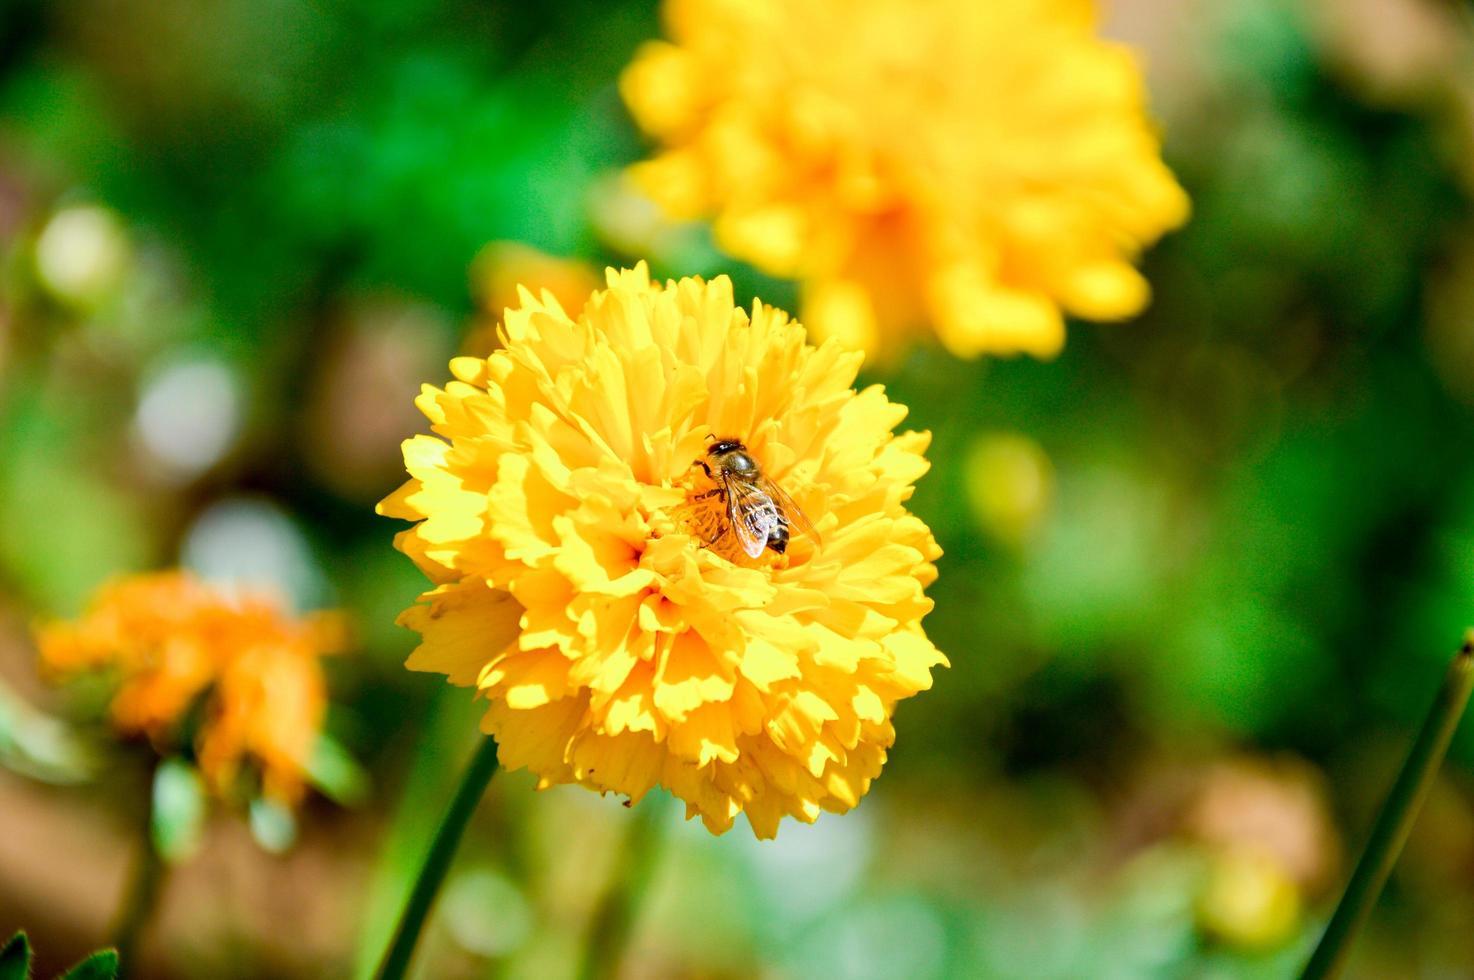 abeille sur fleur jaune photo